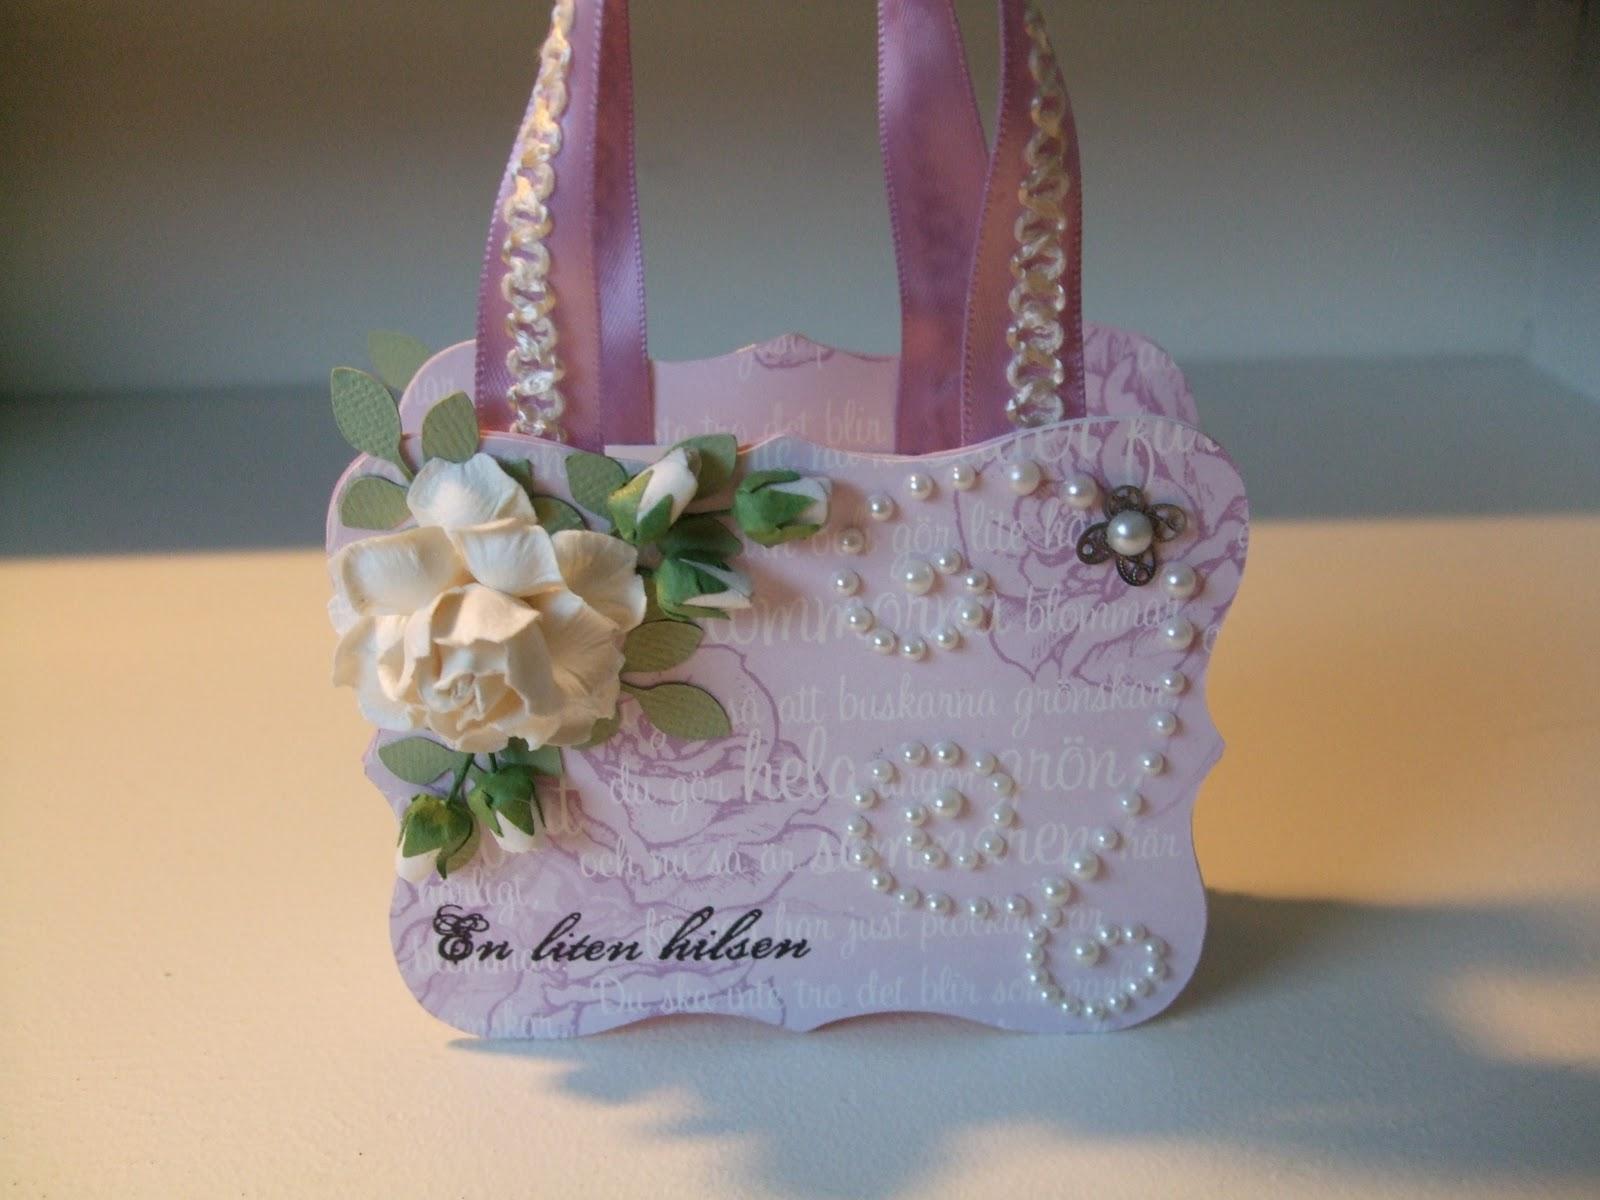 How-to-DIY-Handbag-Style-Paper-Gift-Basket-13.jpg